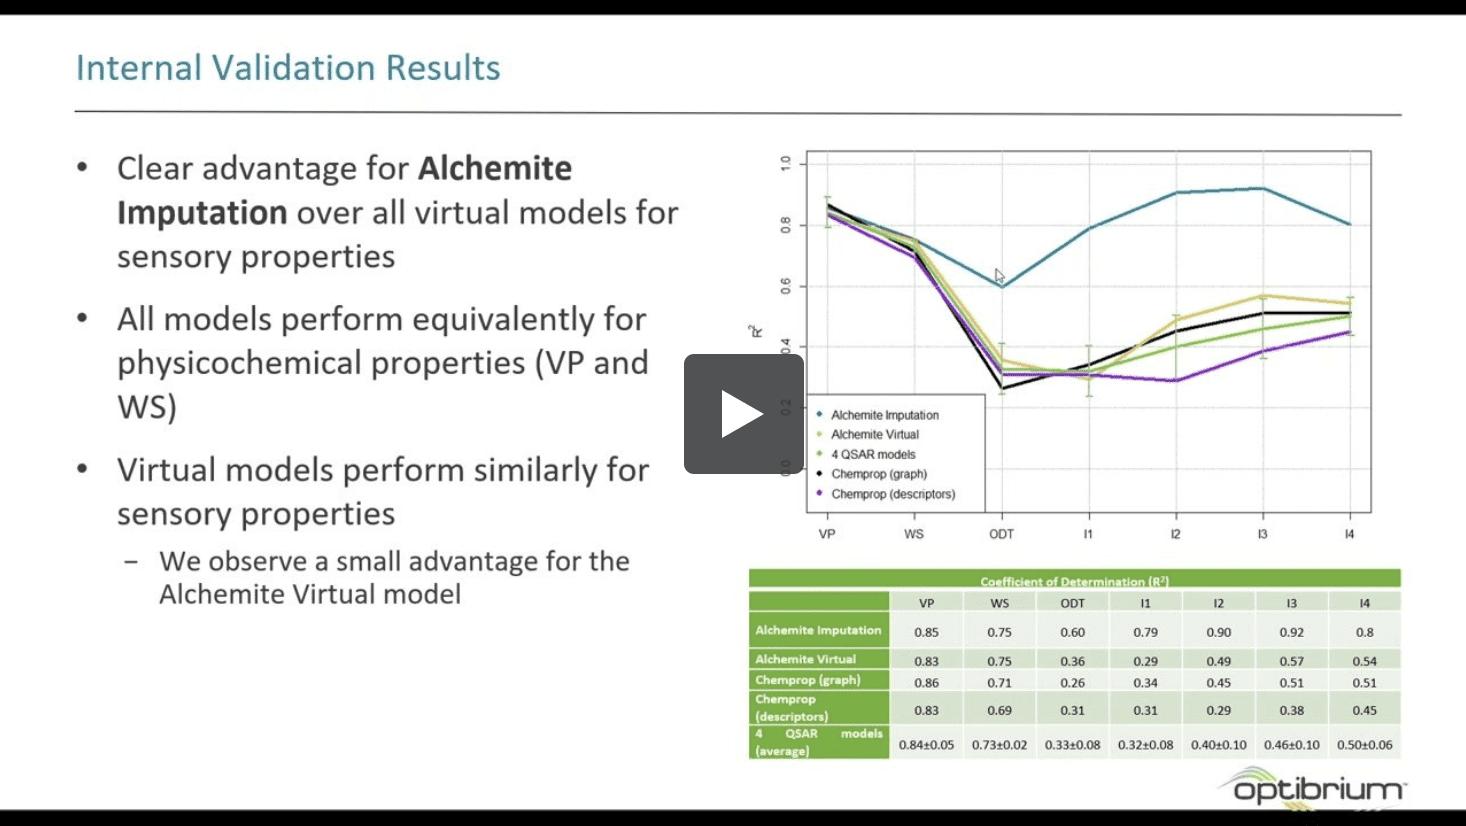 Imputation of Sensory Properties Using Deep Learning: webinar